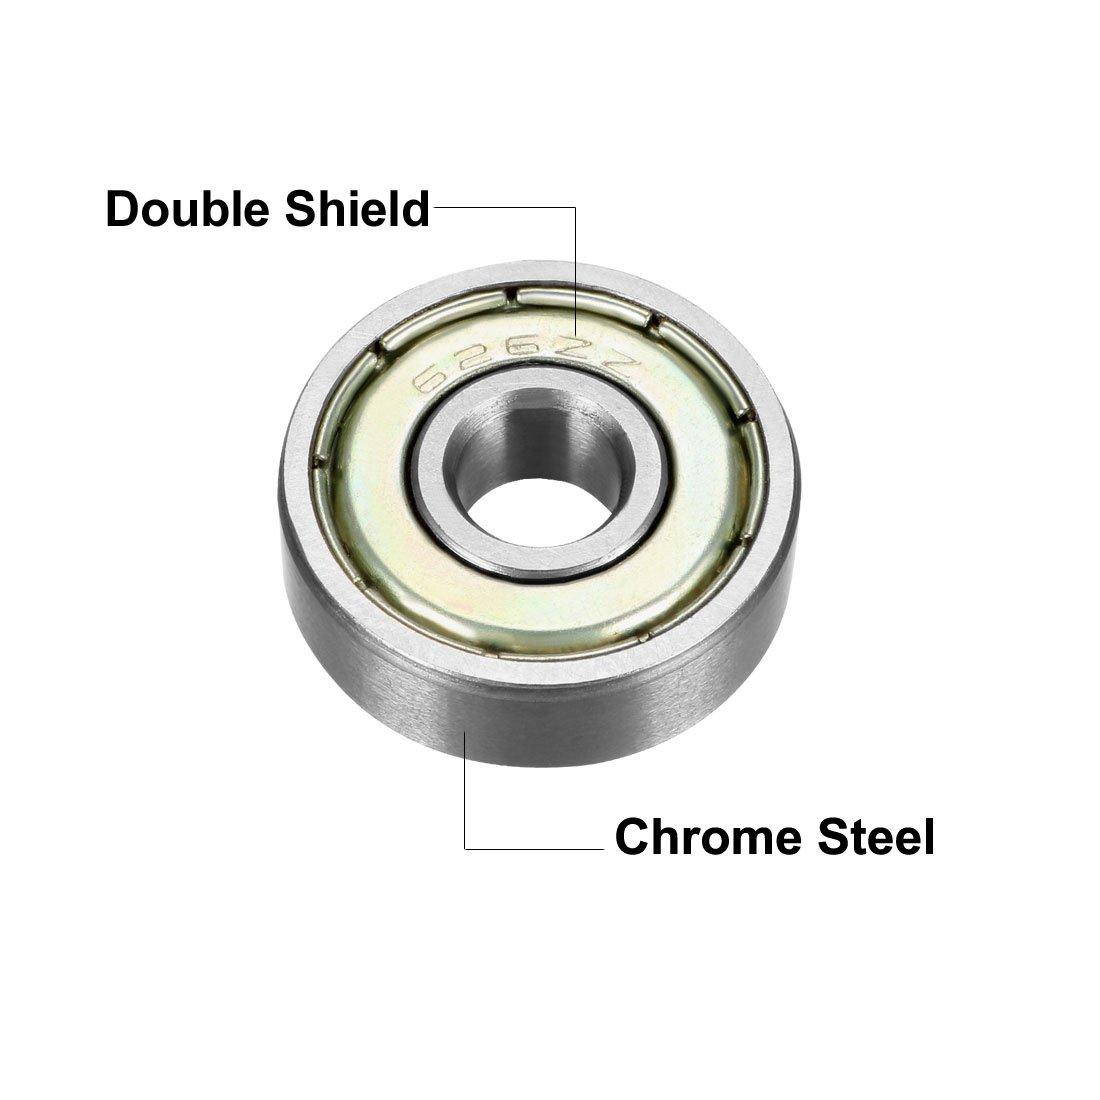 Chrome Steel Premium Lot of 10 pcs 626ZZ Ball Bearings 6mm x 19mm x 6mm